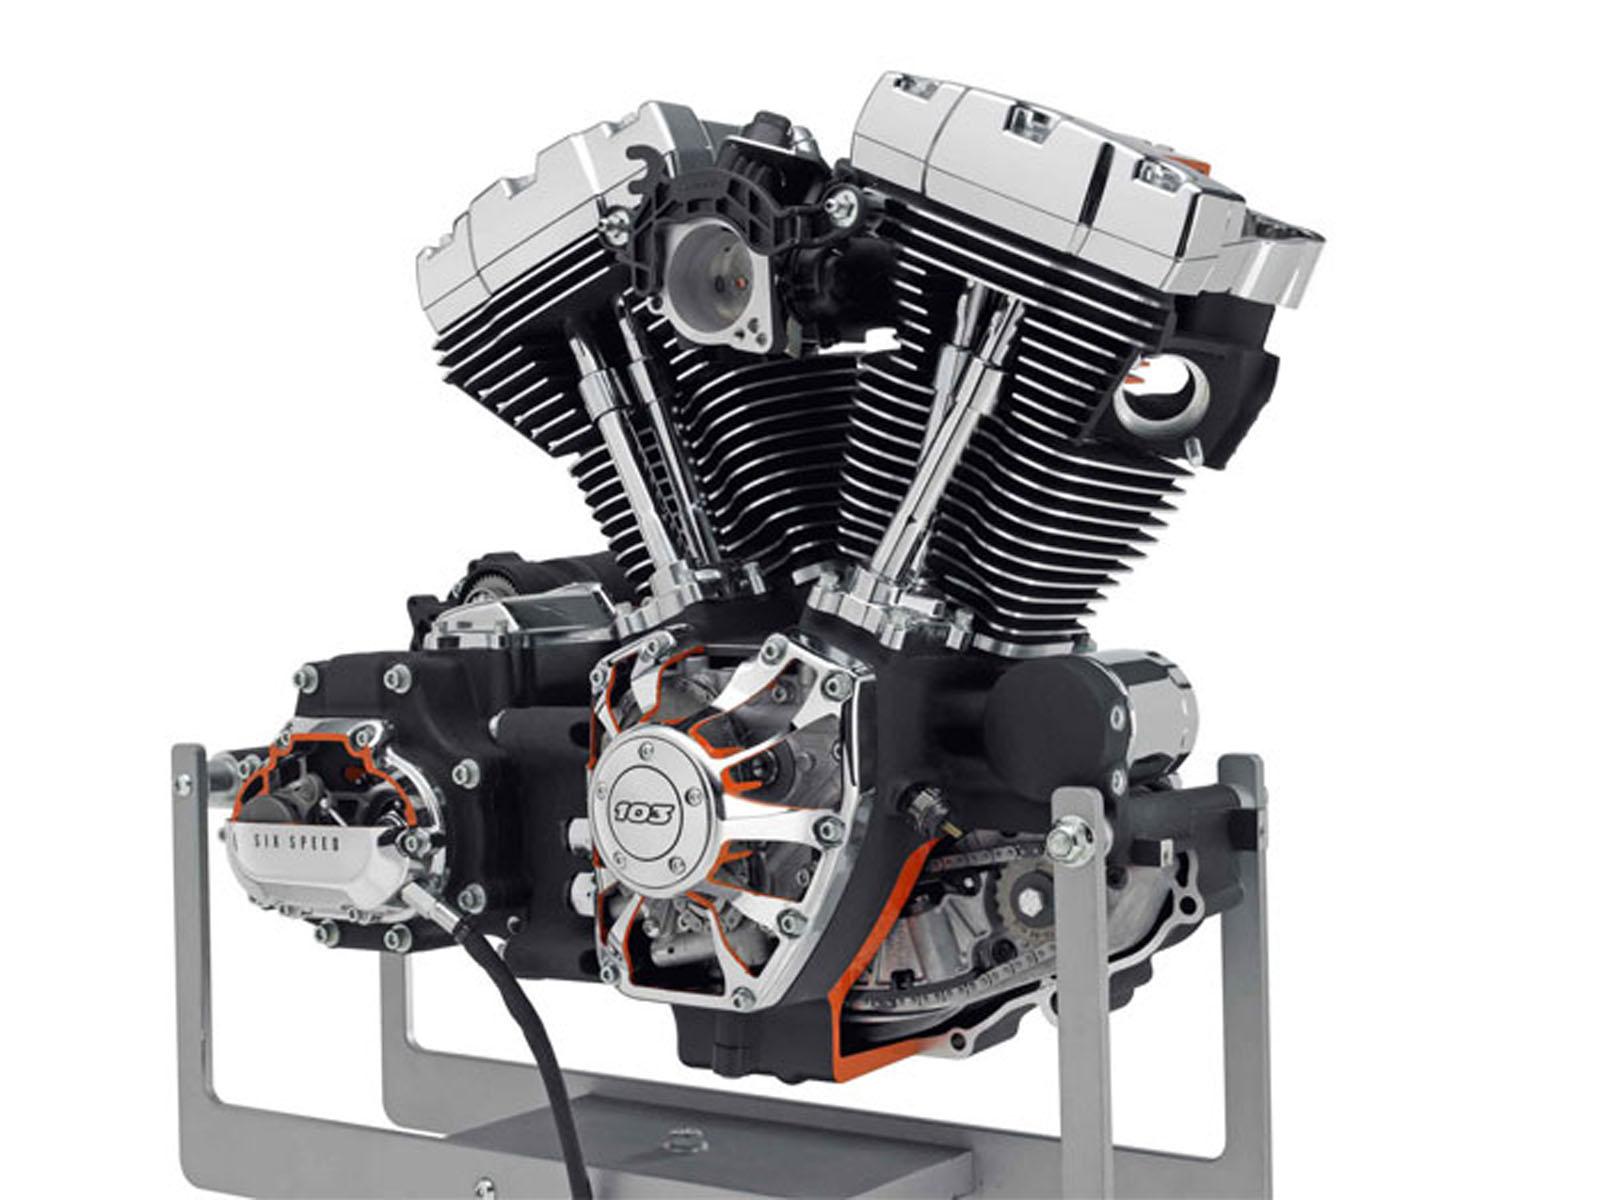 Harley Davidson V Twin Engine Diagrams Harley Free Engine Image For